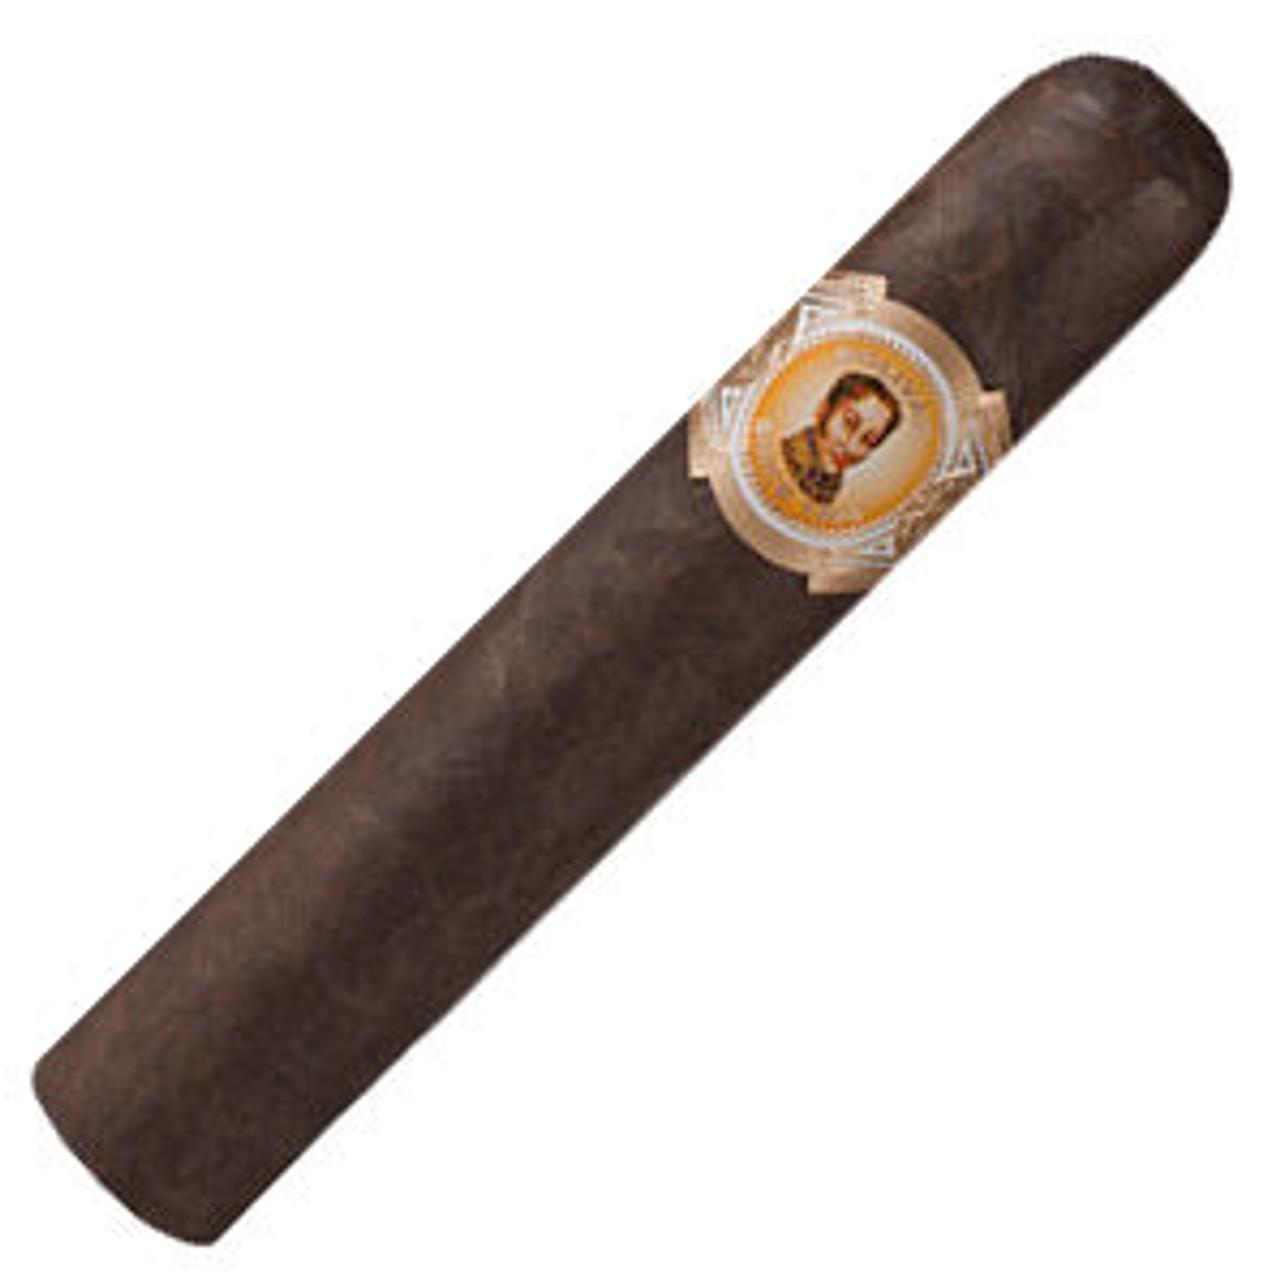 Bolivar Cofradia No. 554 Cigars - 5 x 54 (Pack of 5)